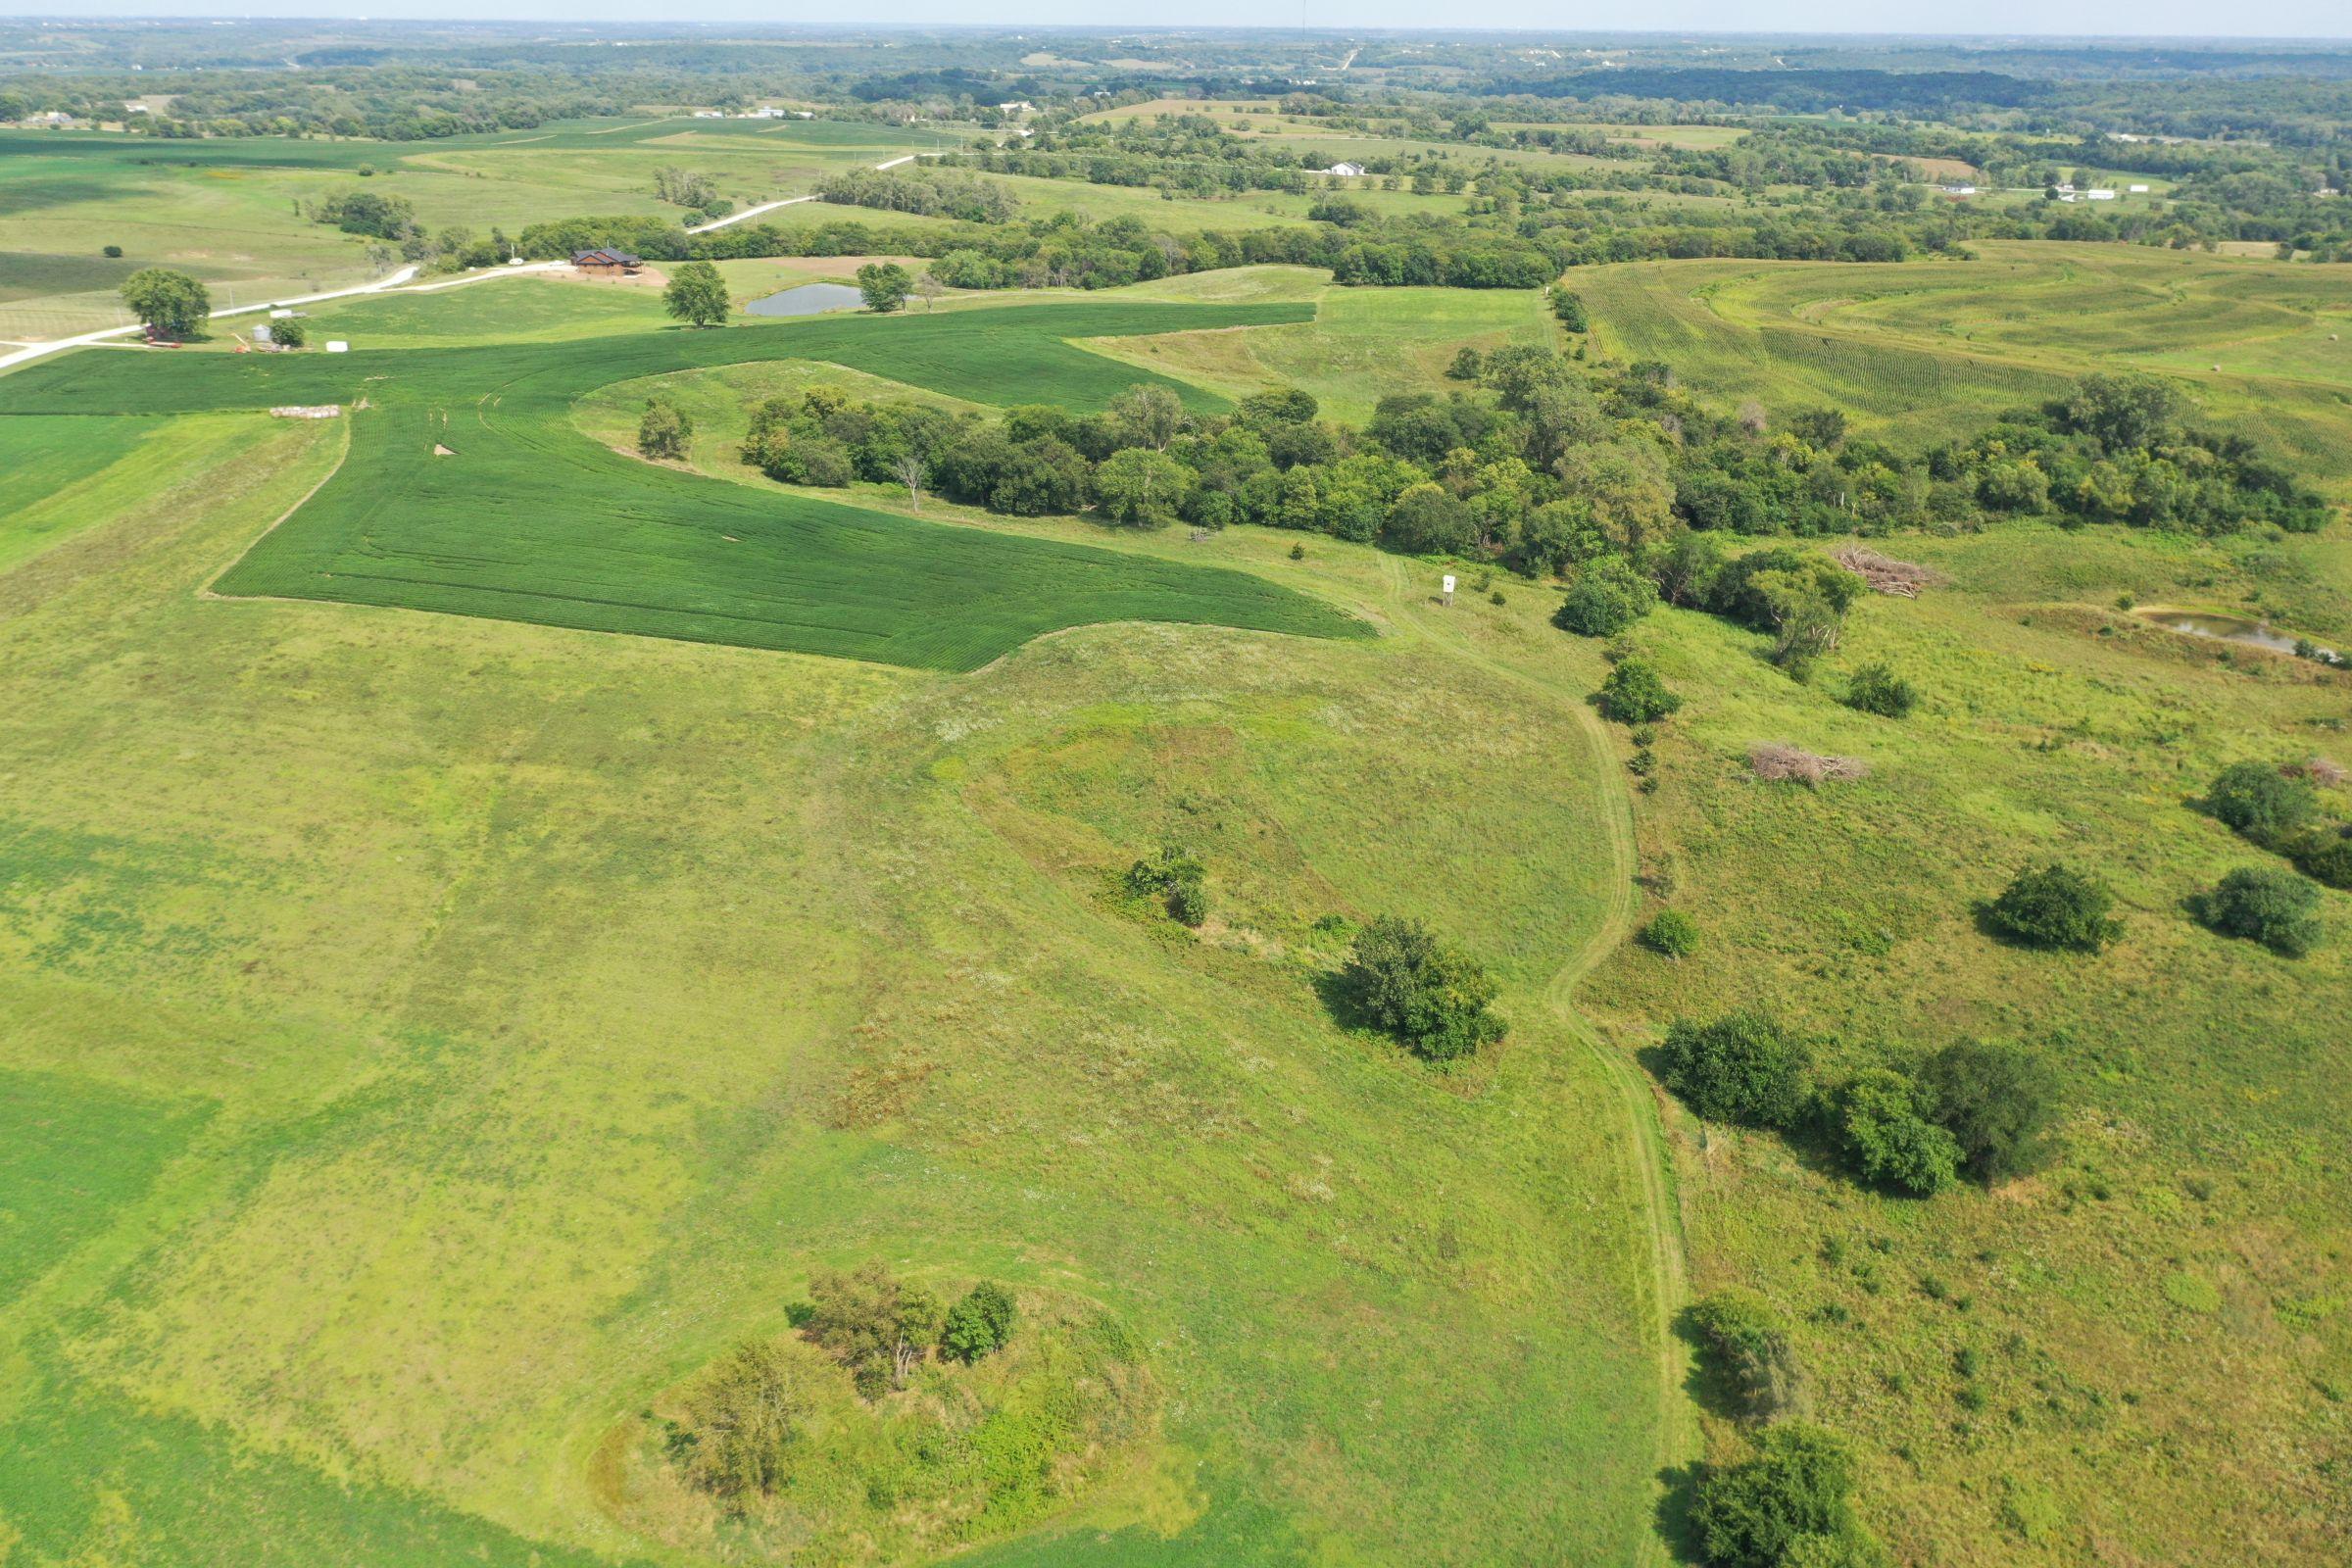 land-warren-county-iowa-8-acres-listing-number-15696-5-2021-08-24-222439.JPG